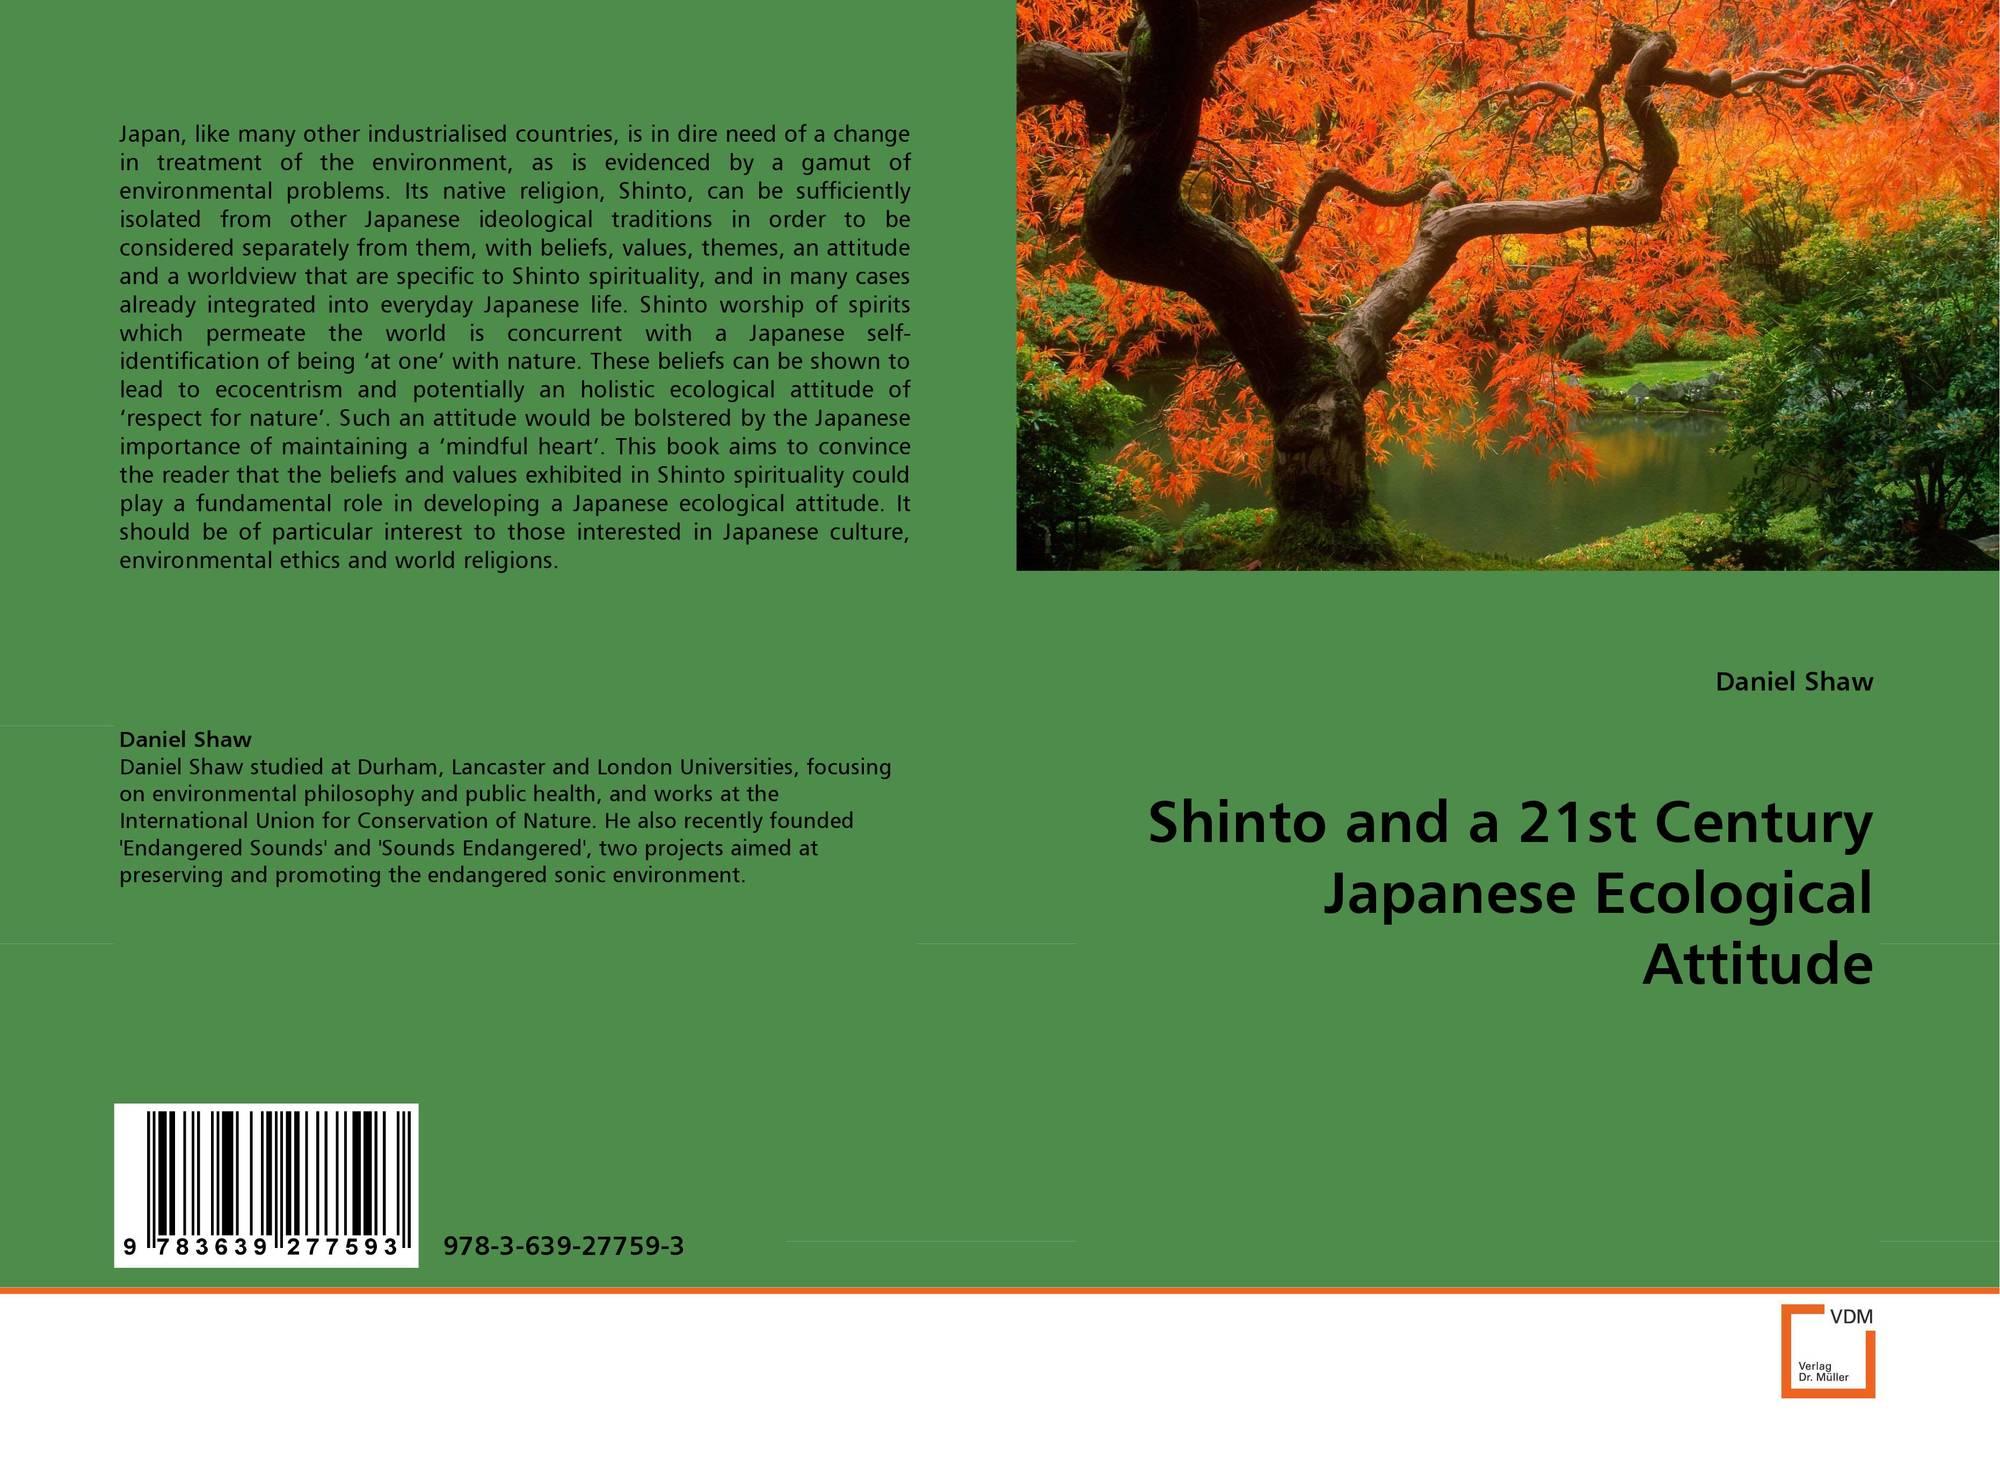 shinto philosophy